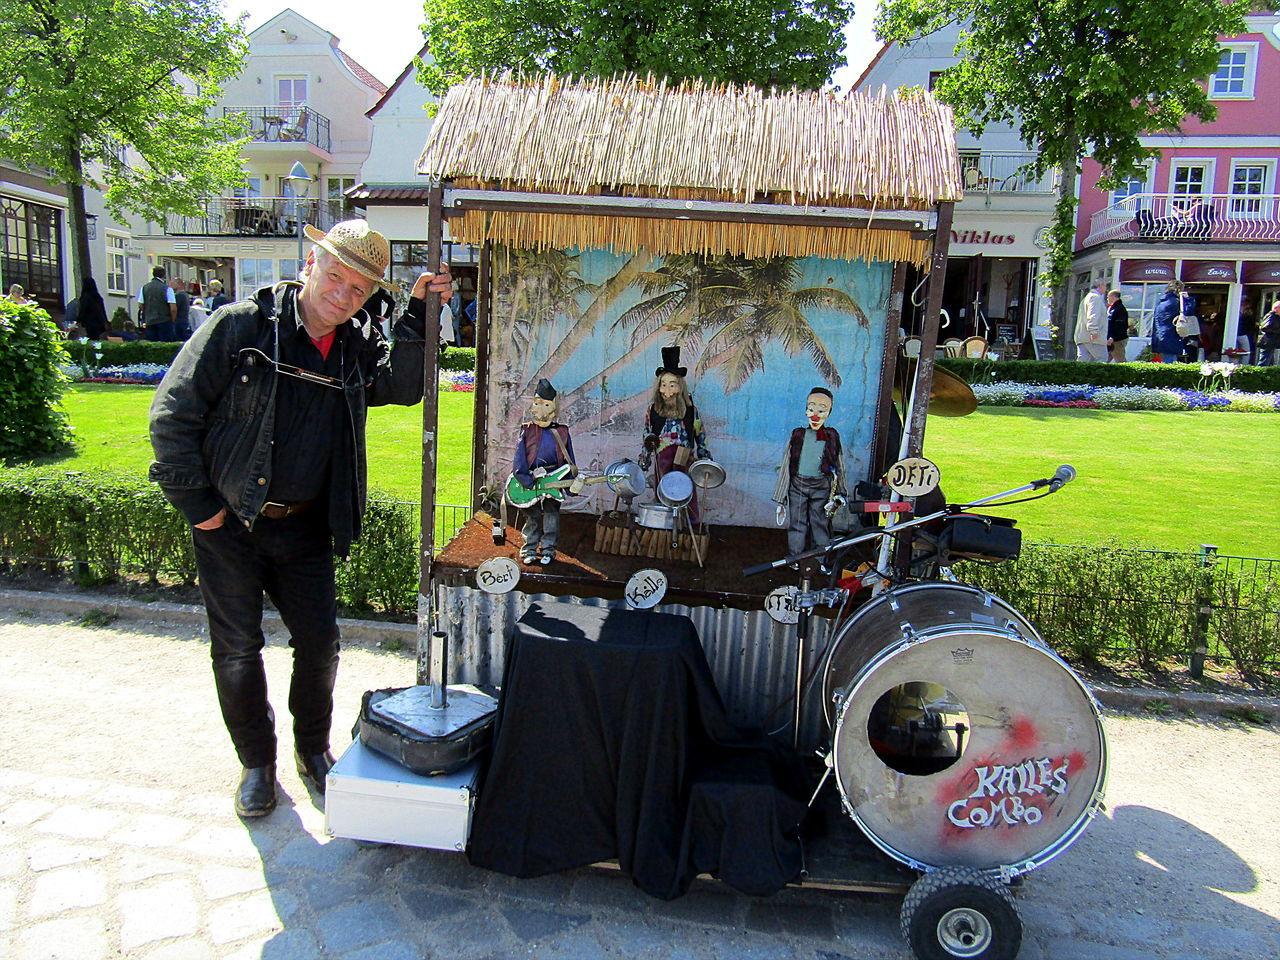 Gestern In Warnemünde--Rostock One Person Outdoors Real People Strassenmusiker-lässt Die Puppen Tanzen-- Street Musician Makes The Dolls Dance